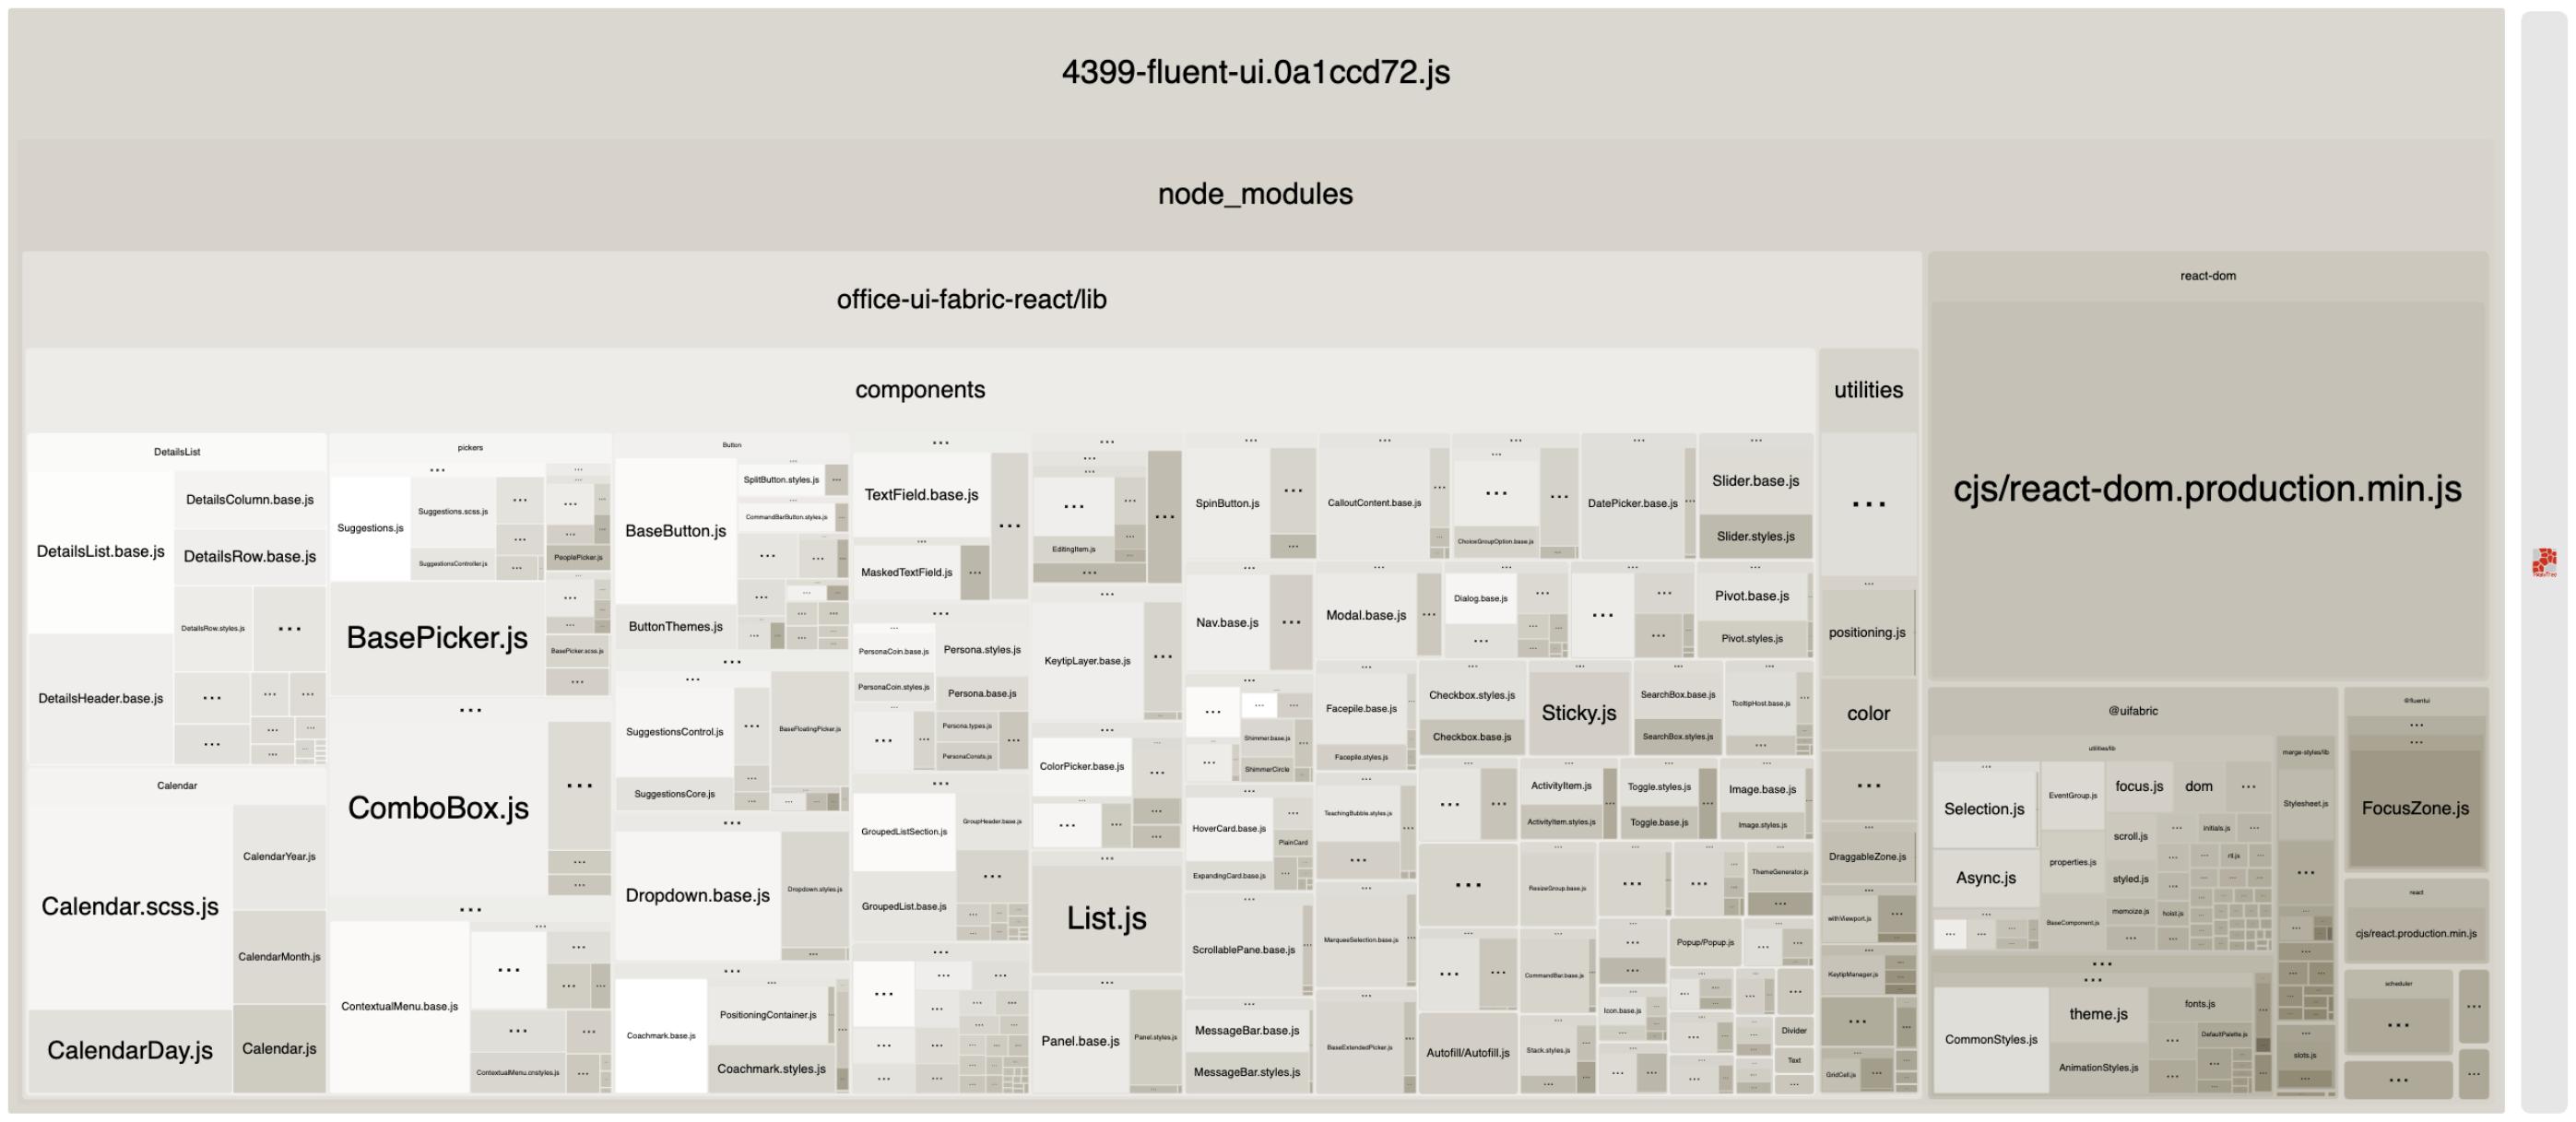 A screenshot of the bundle analyzer output